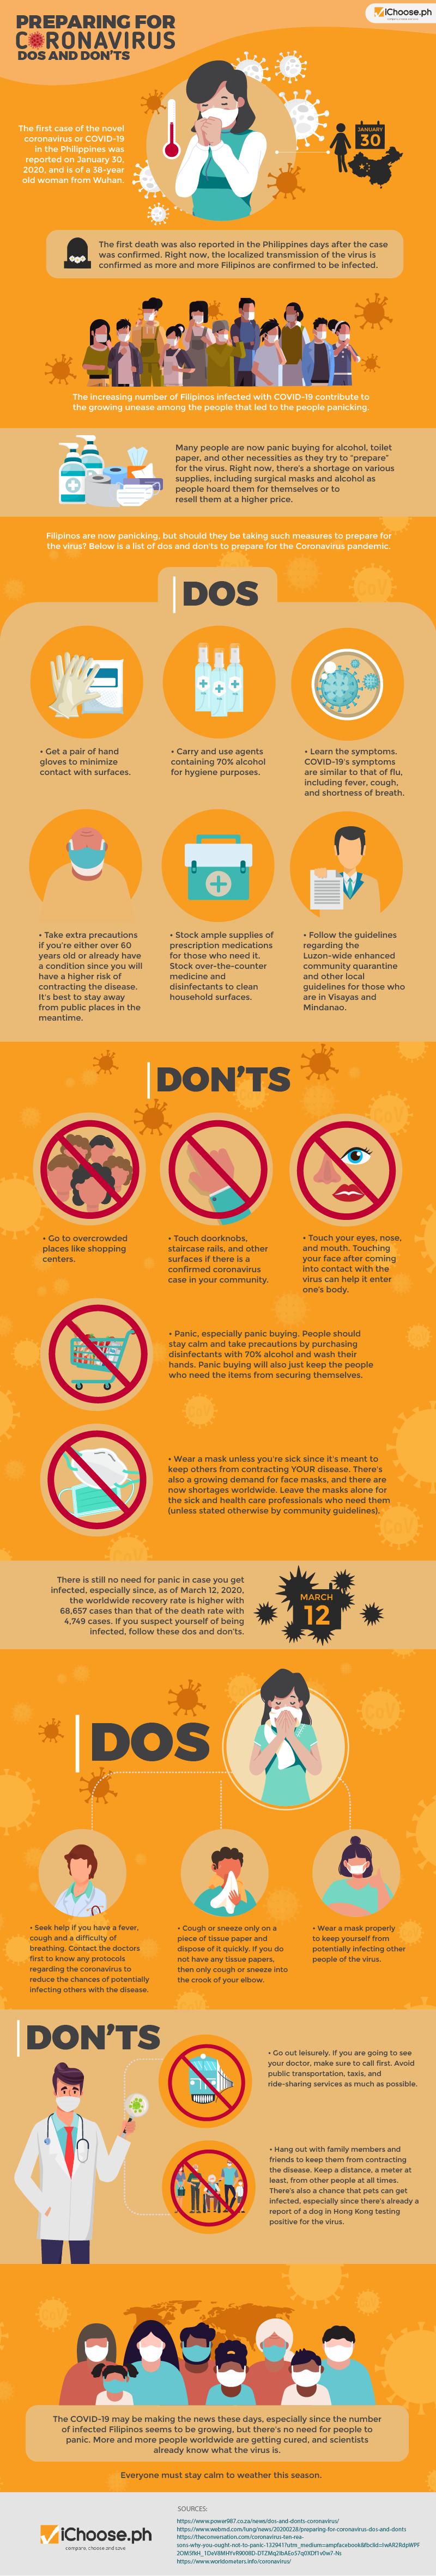 Preparing for Coronavirus Dos and Don'ts update